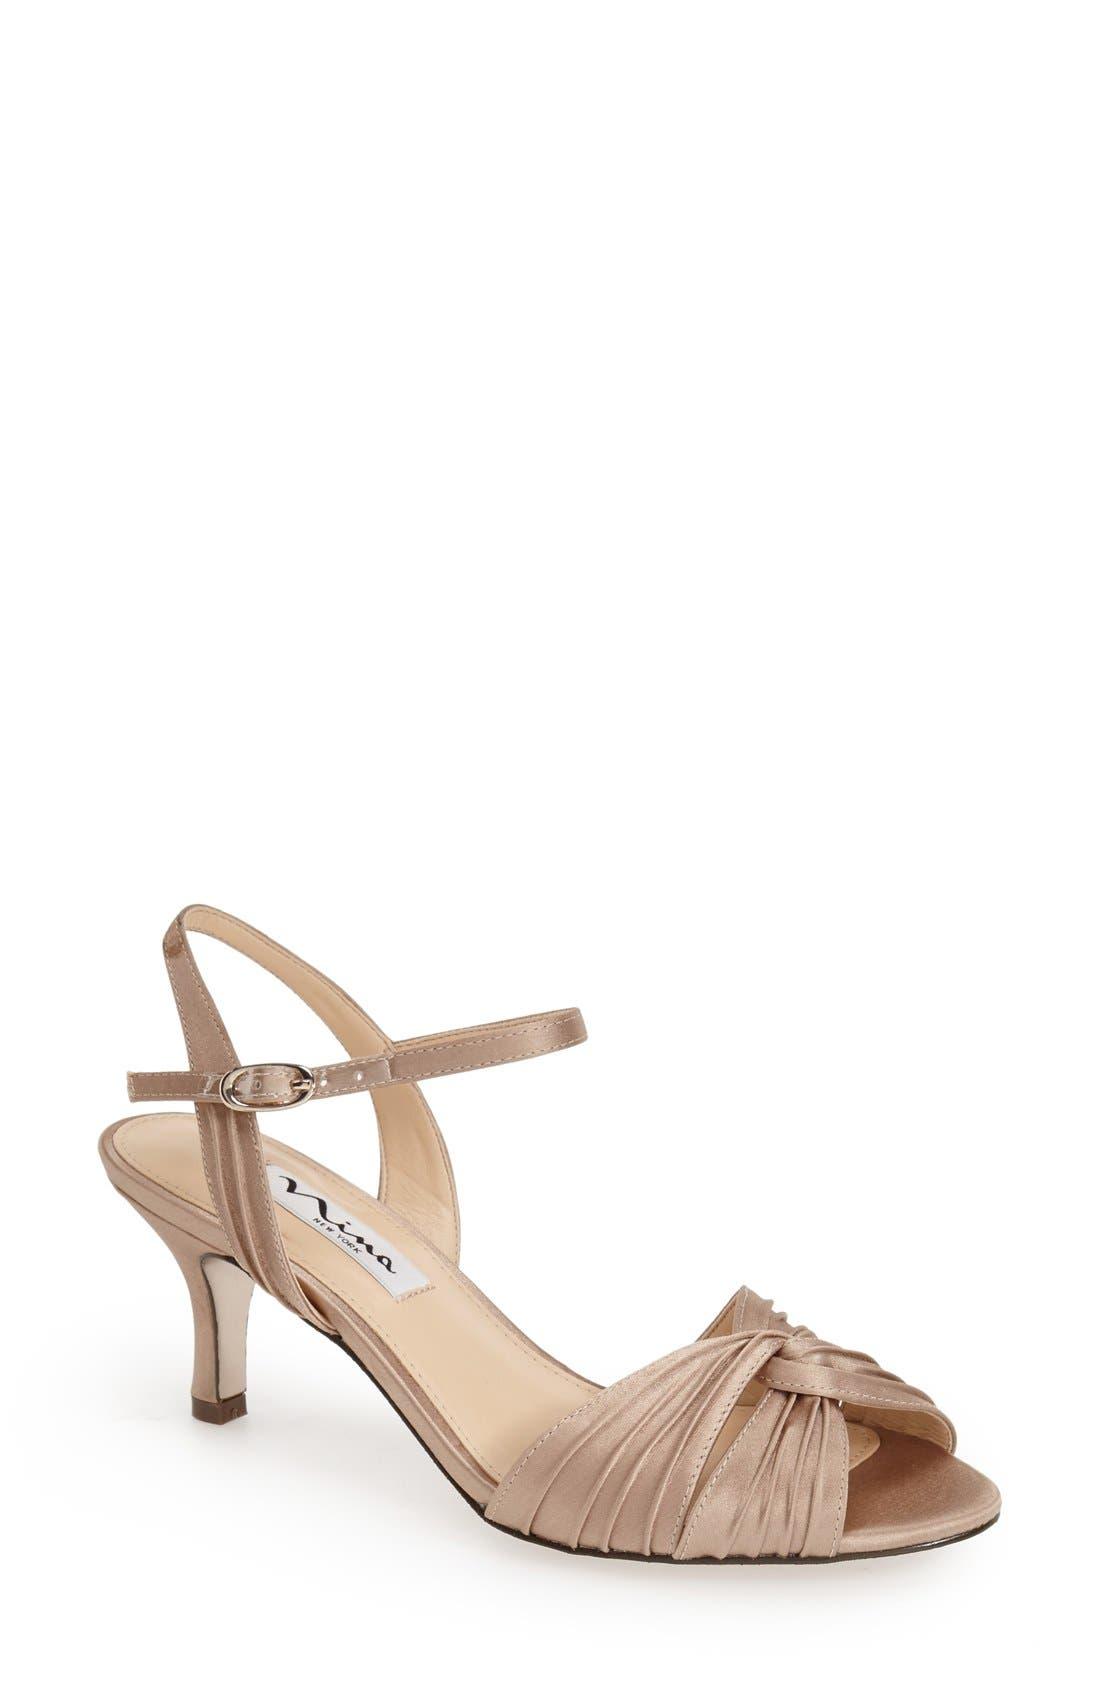 Alternate Image 1 Selected - Nina 'Camille' Pleated Sandal (Women)